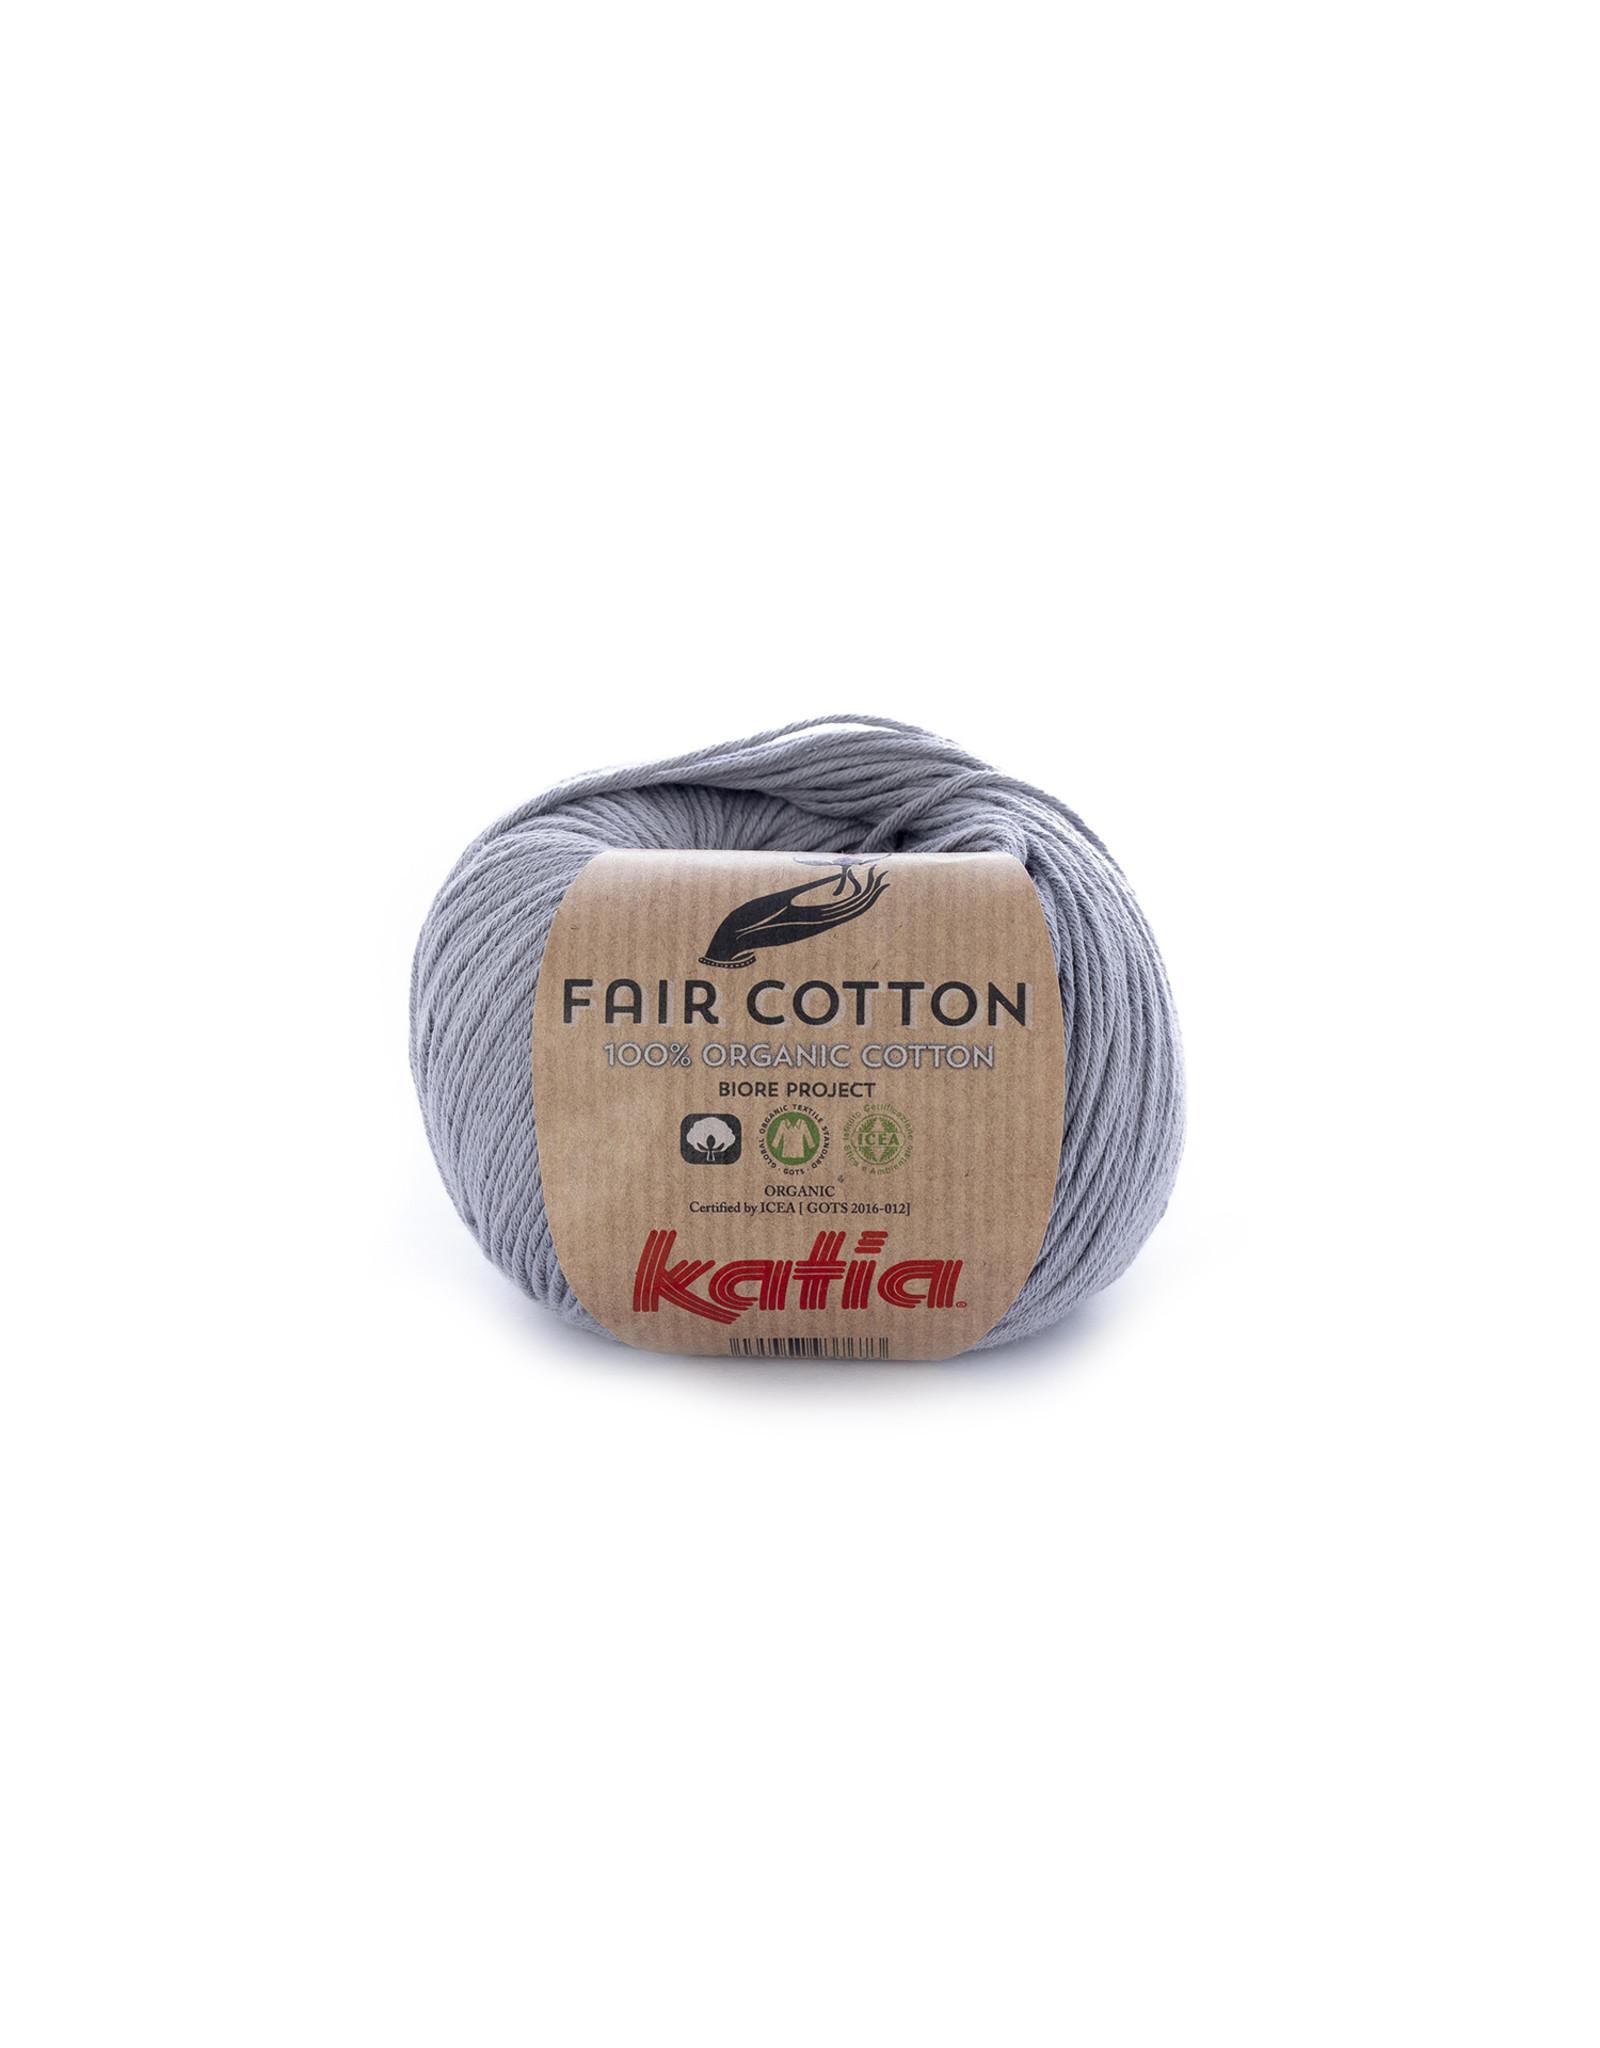 Katia Katia Fair Cotton 26 - medium grijs - 50 gr. - 100% biol. katoen